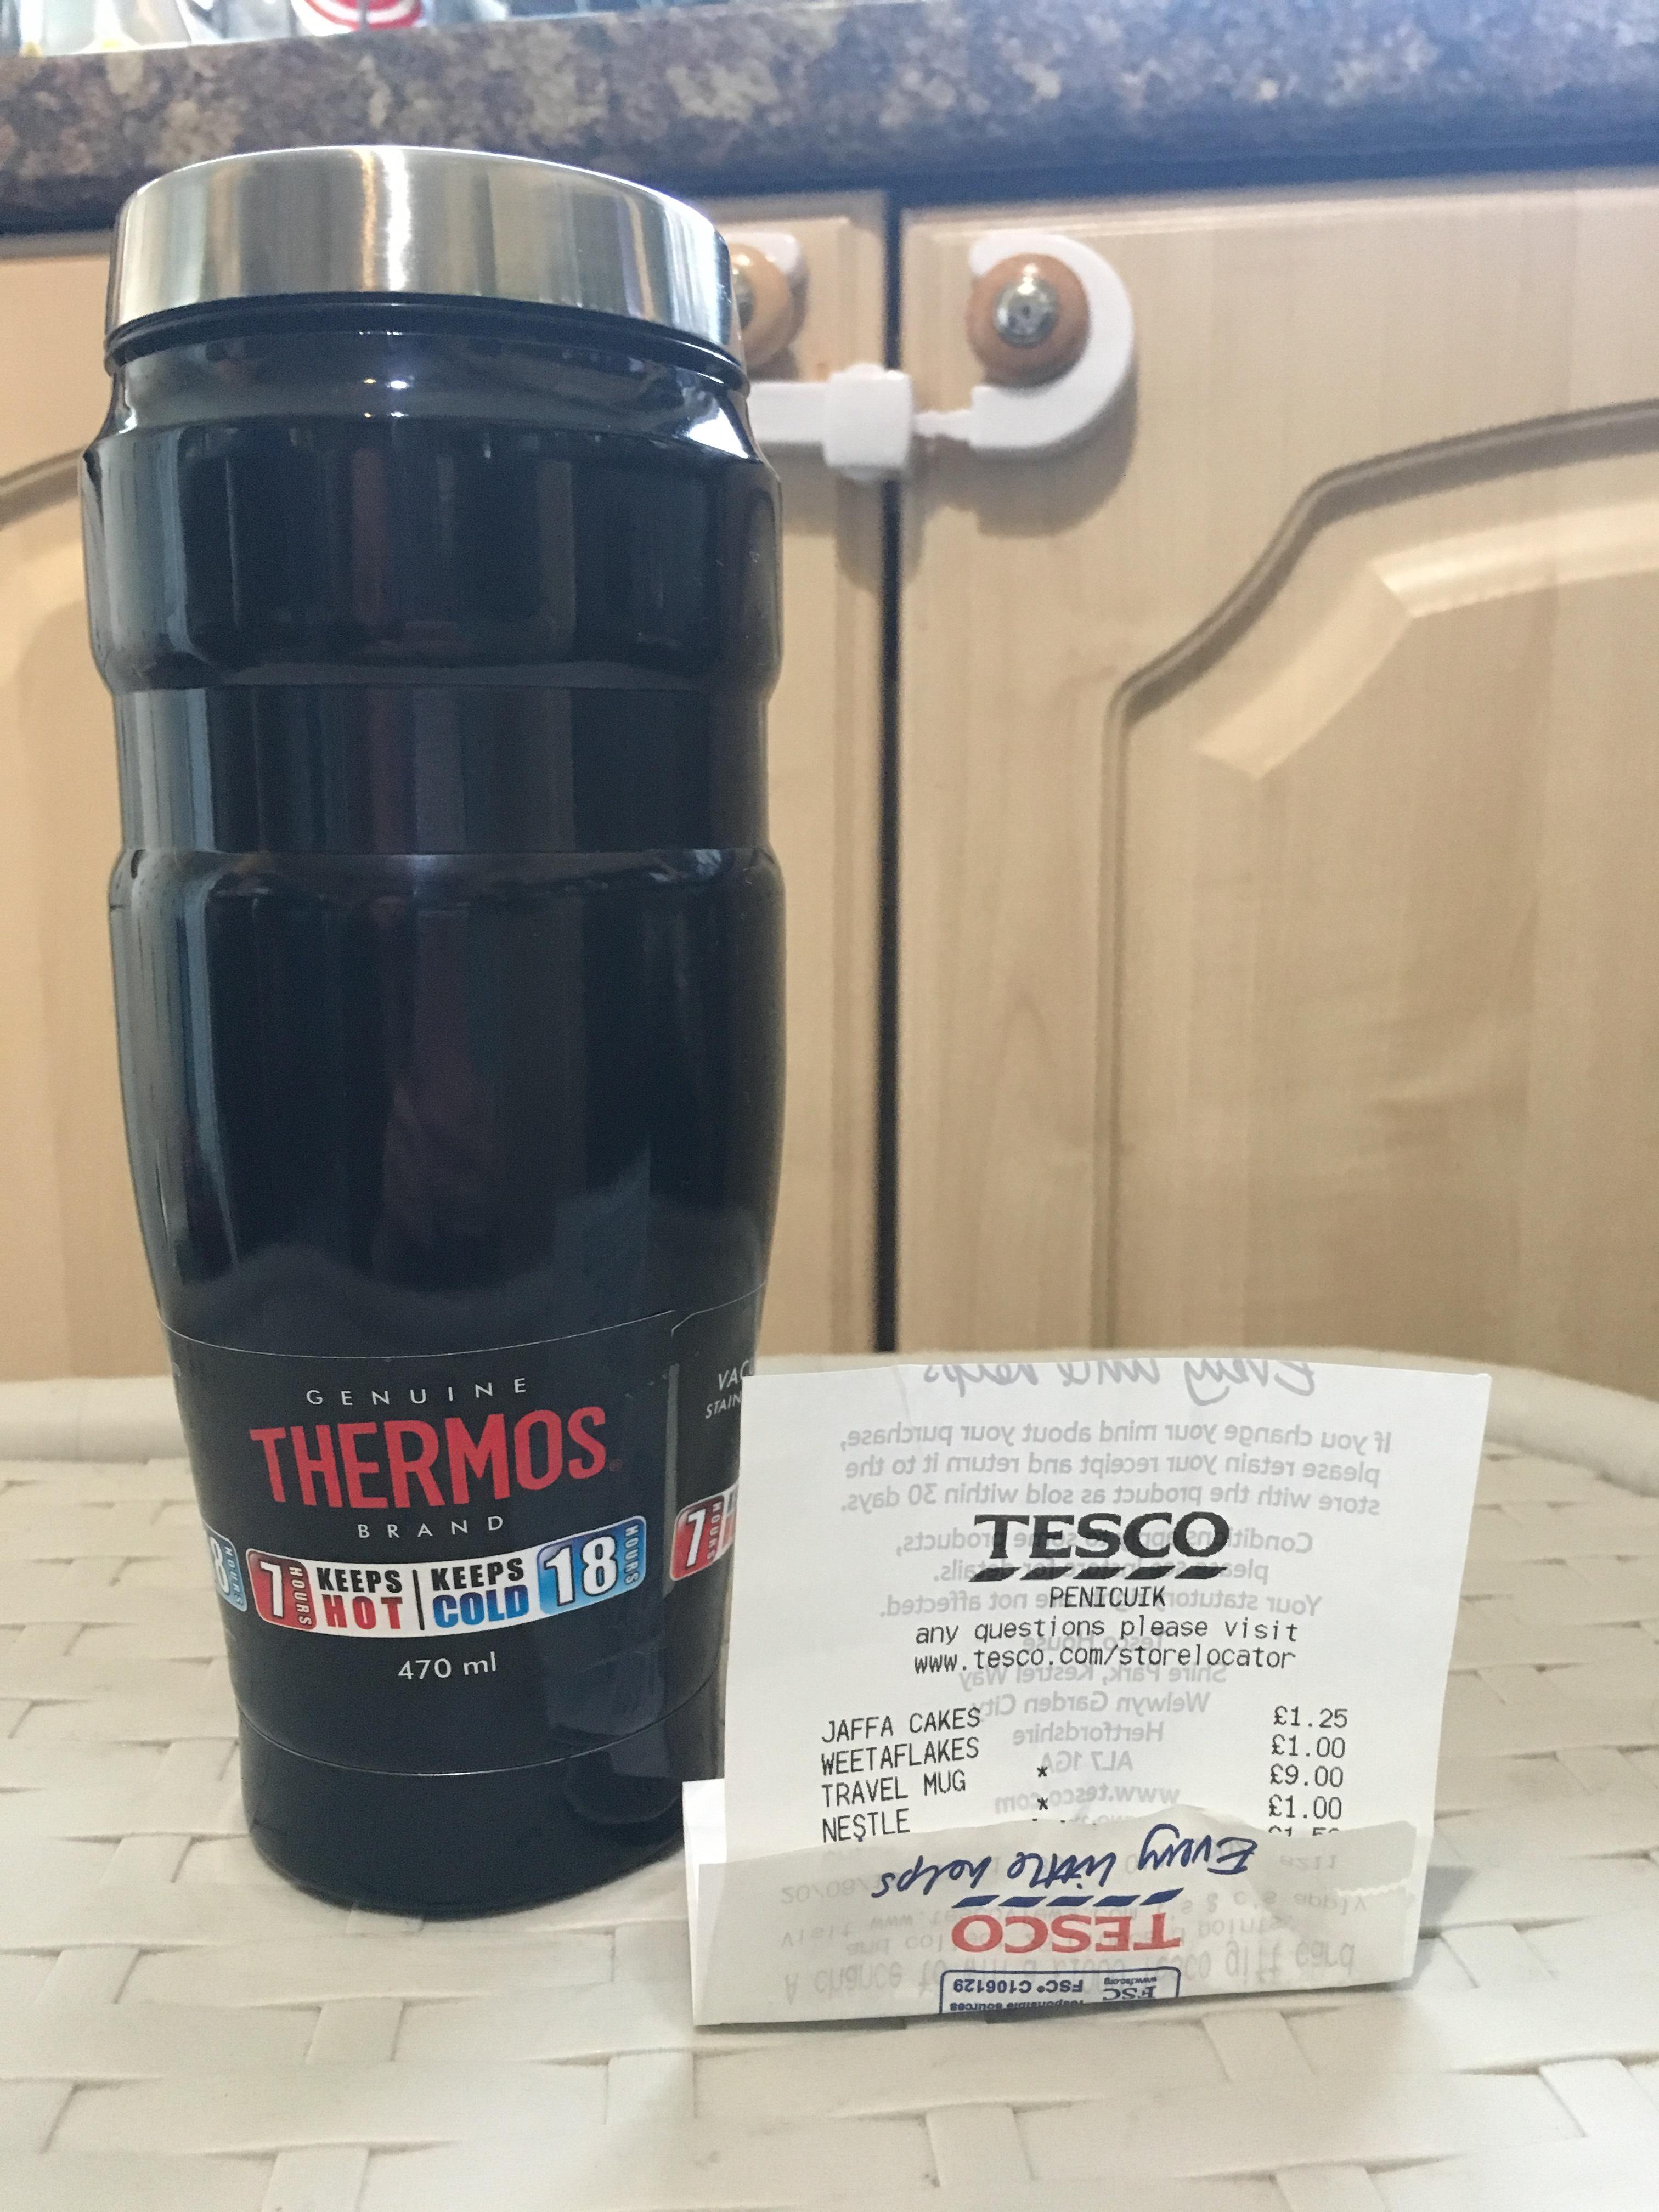 Thermos King Travel Tumbler £9 Tesco (Penicuik)